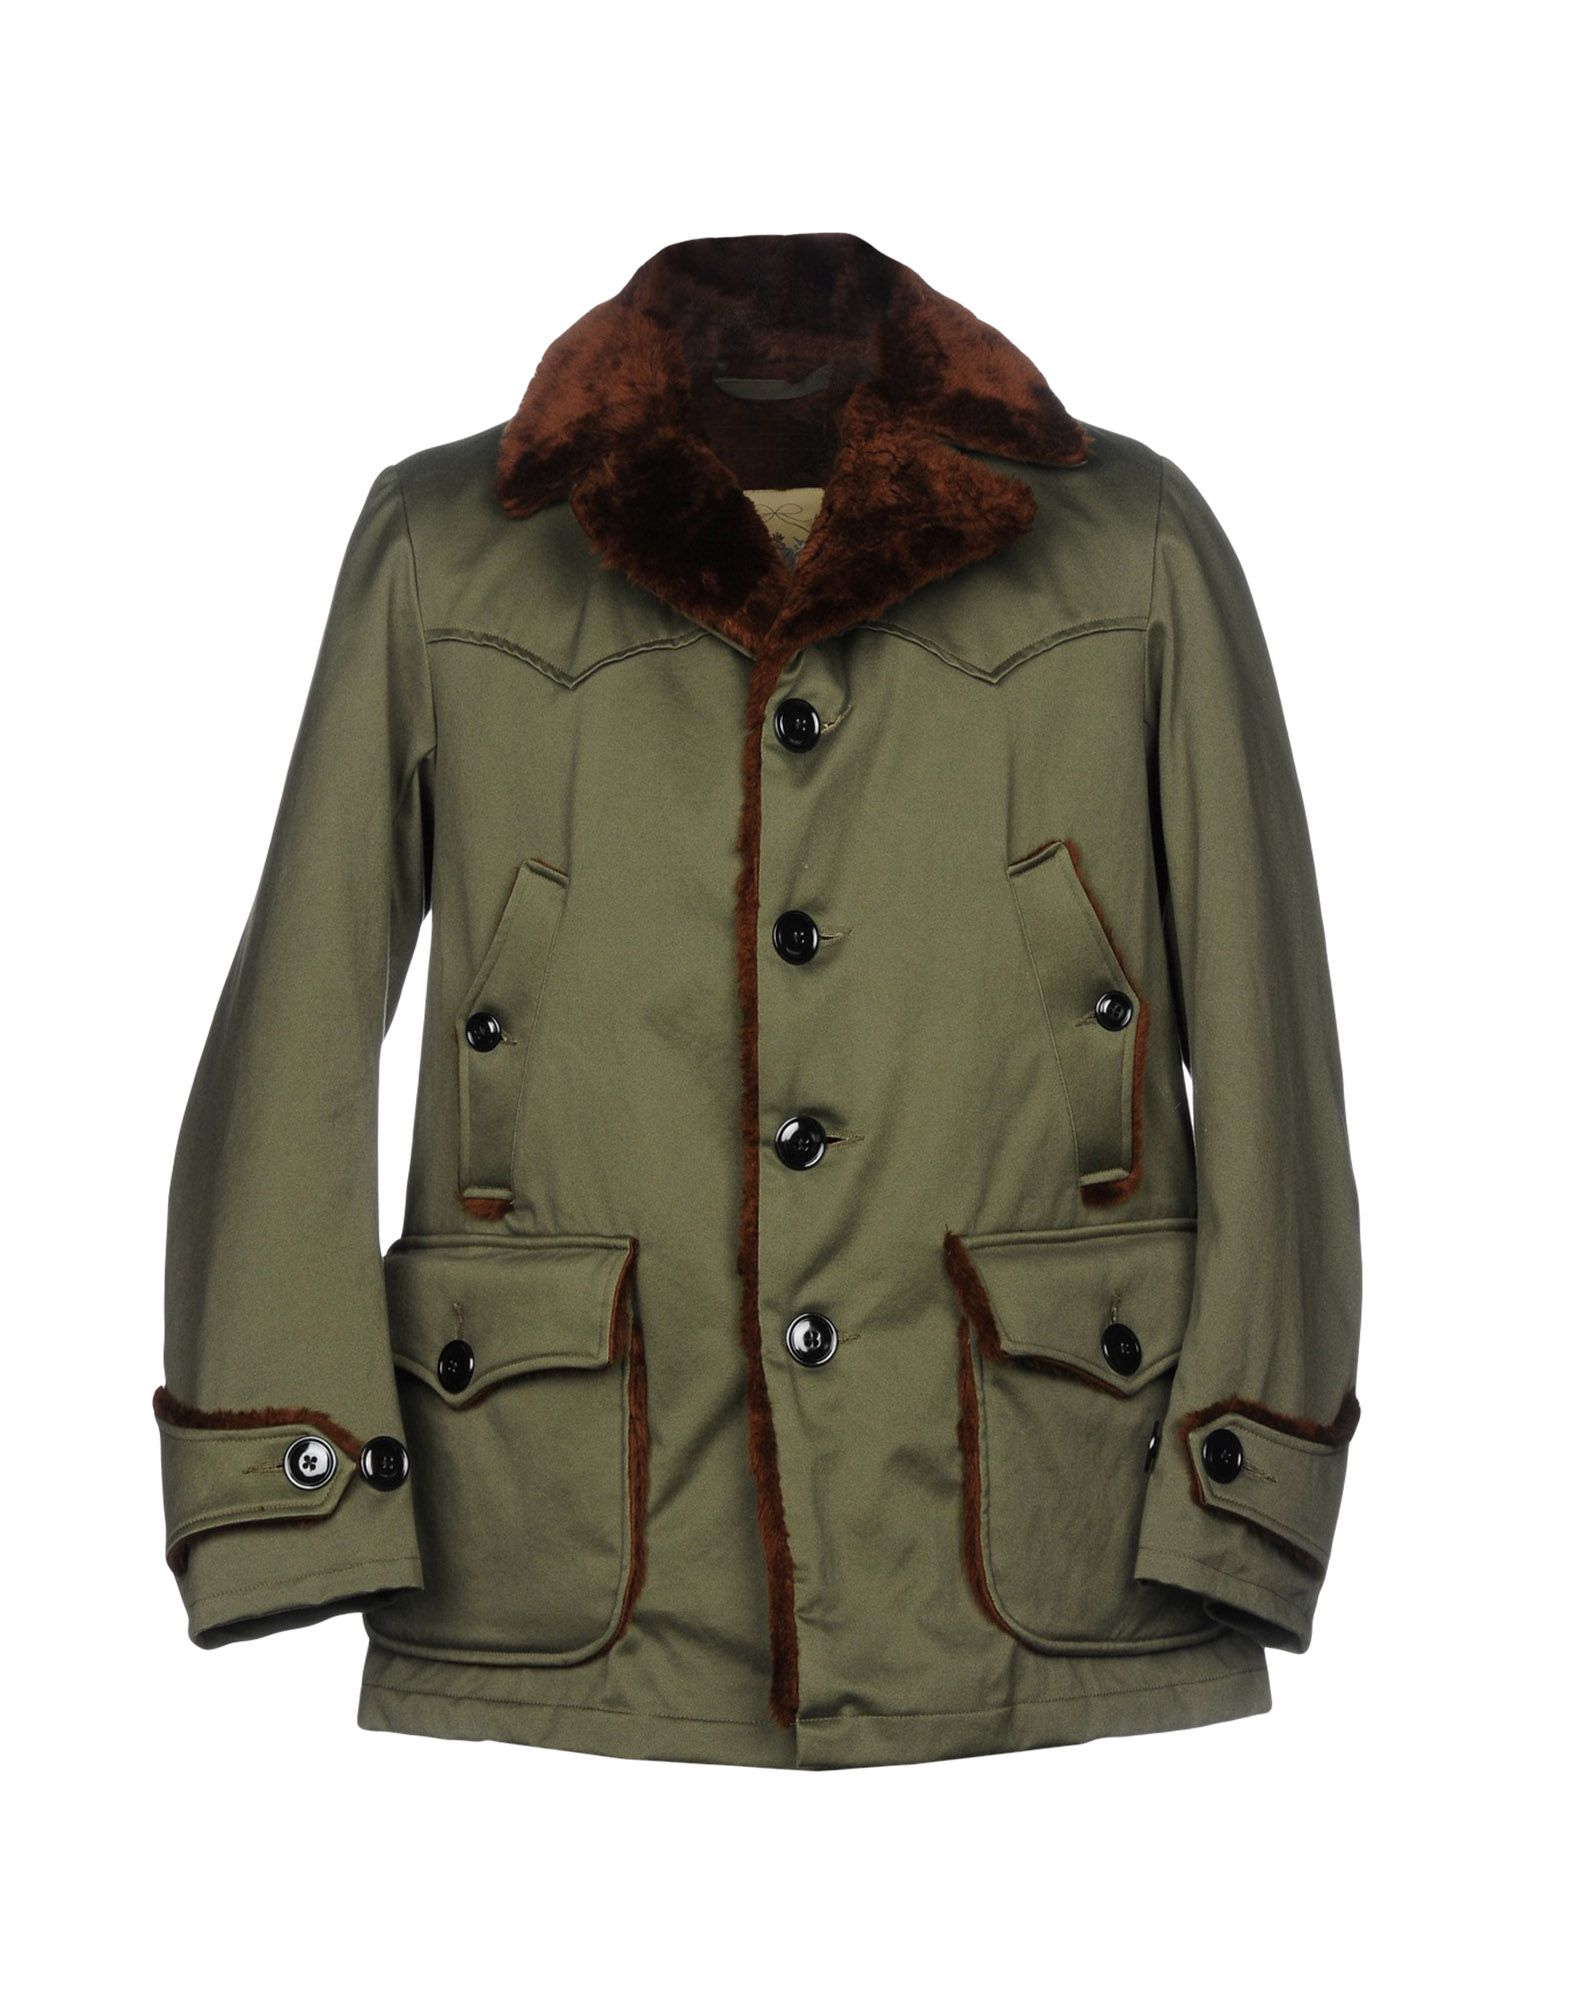 MONITALY Jacket in Military Green